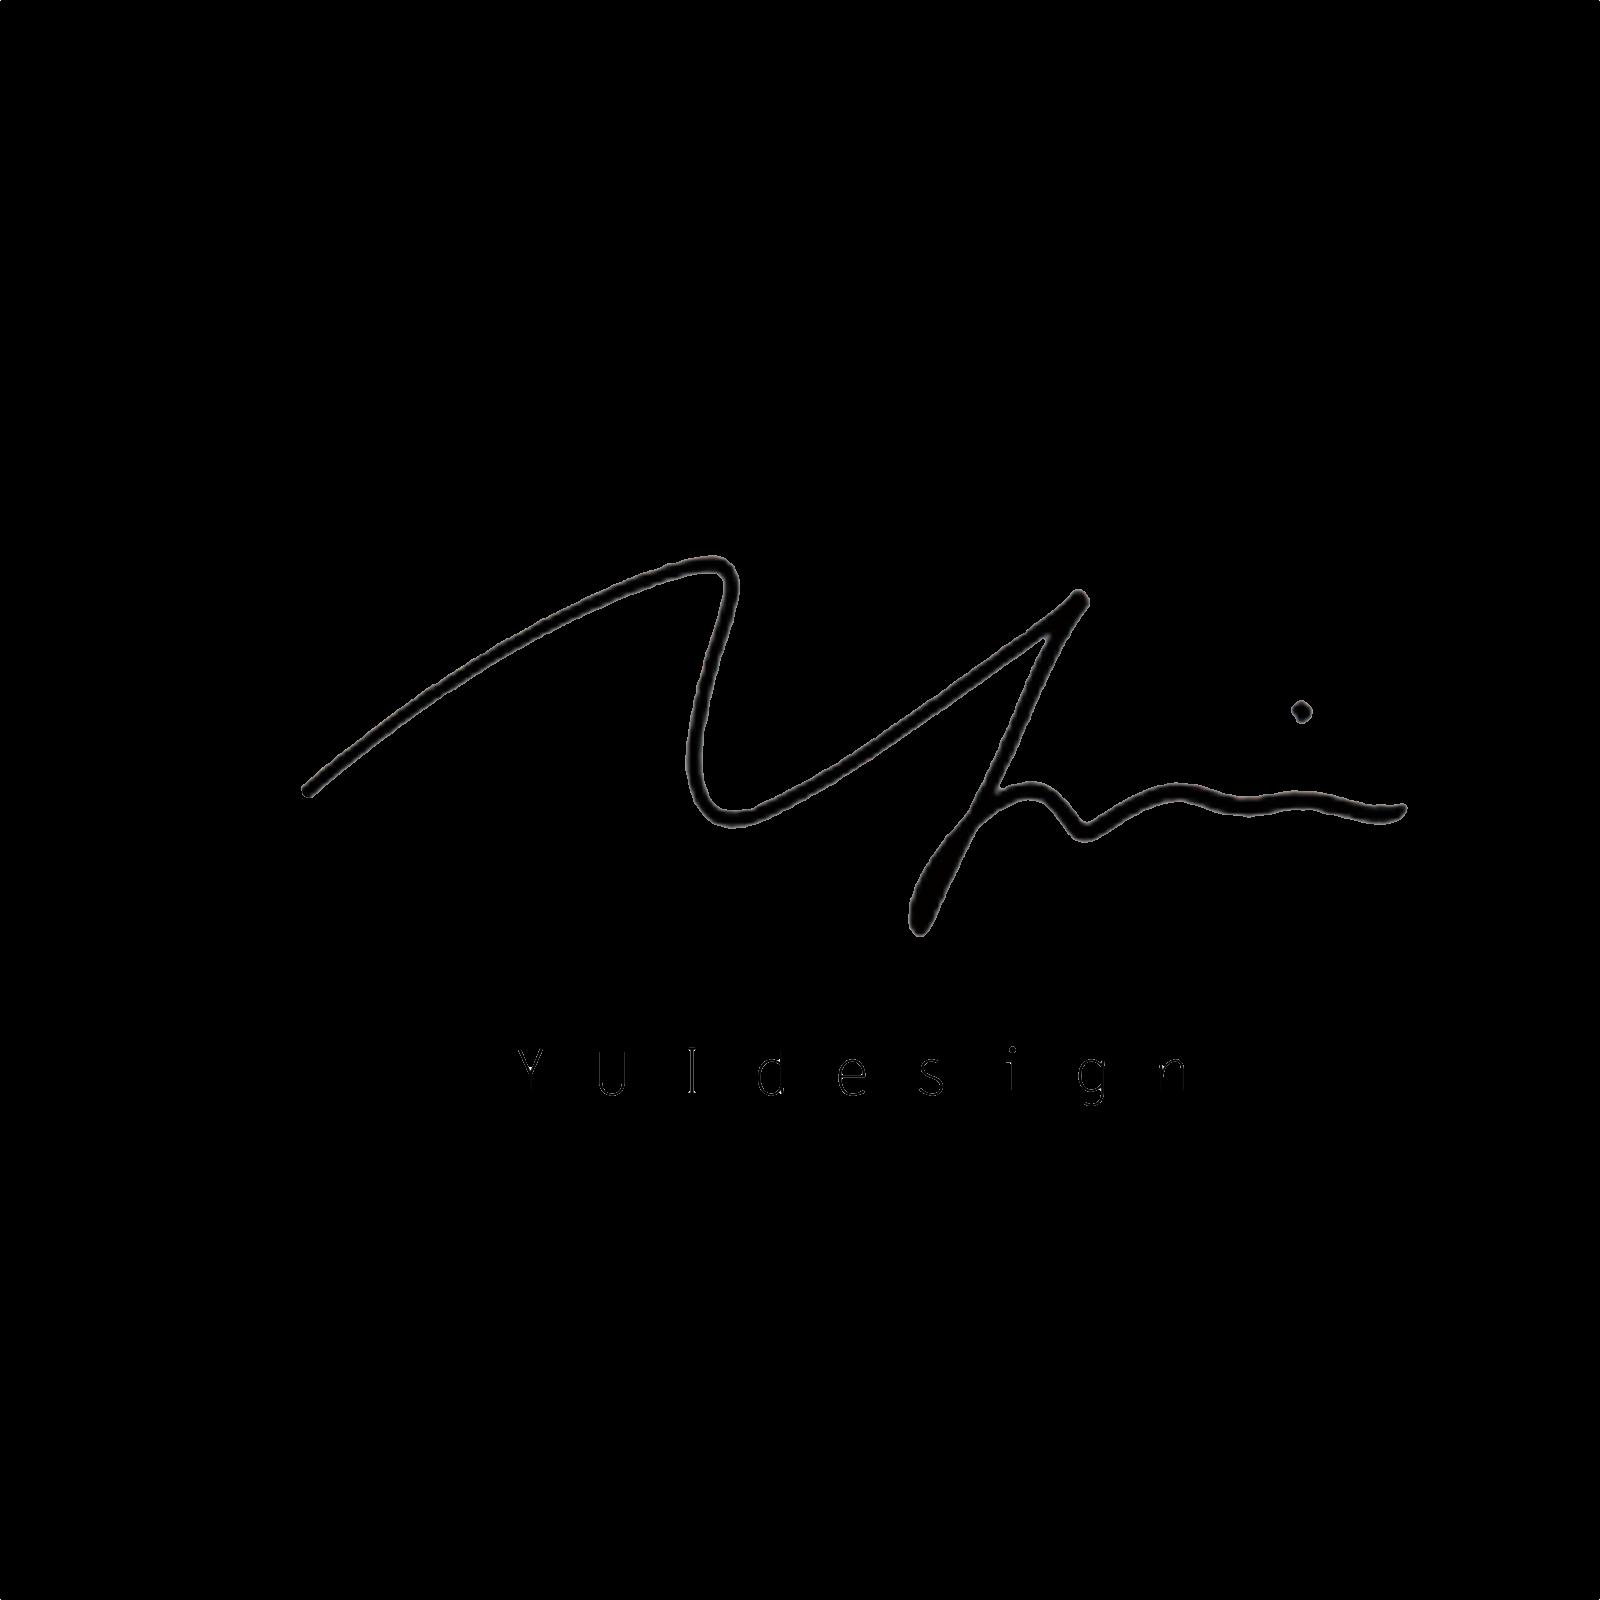 YUIdesign